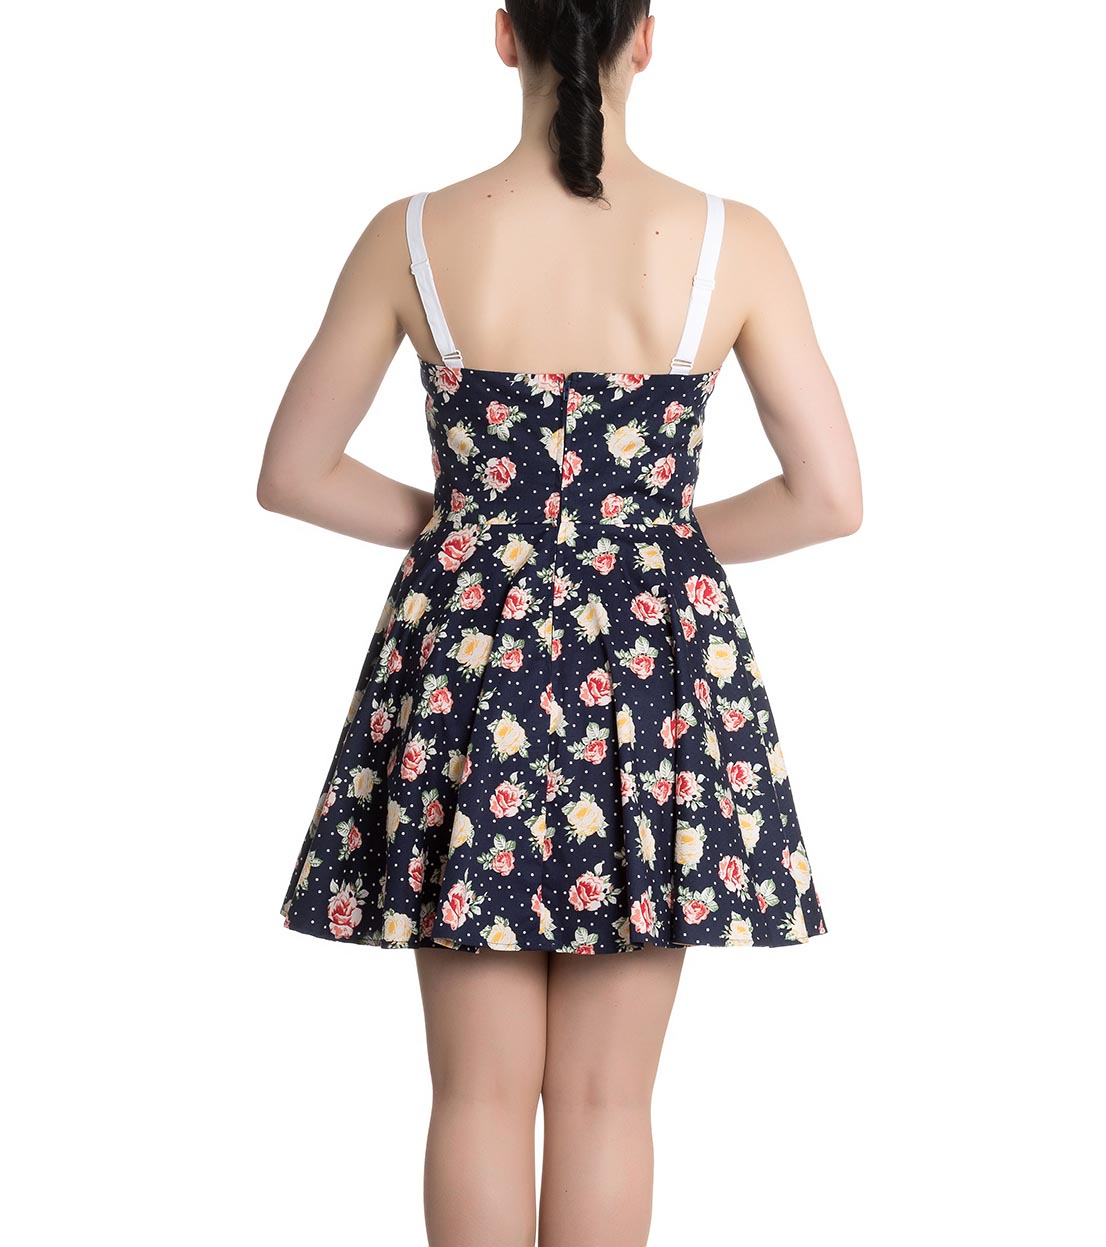 Hell-Bunny-Navy-Blue-Floral-Roses-Flowers-Mini-Dress-EMMA-Polka-Dot-All-Sizes thumbnail 17